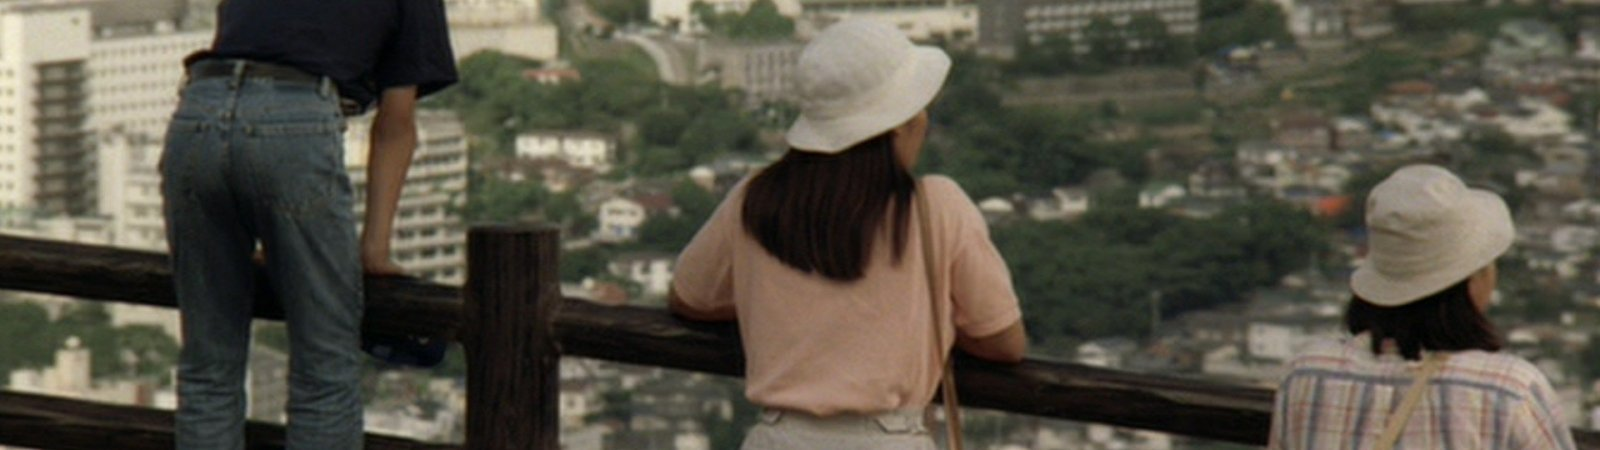 Photo dernier film Sachiko Murase